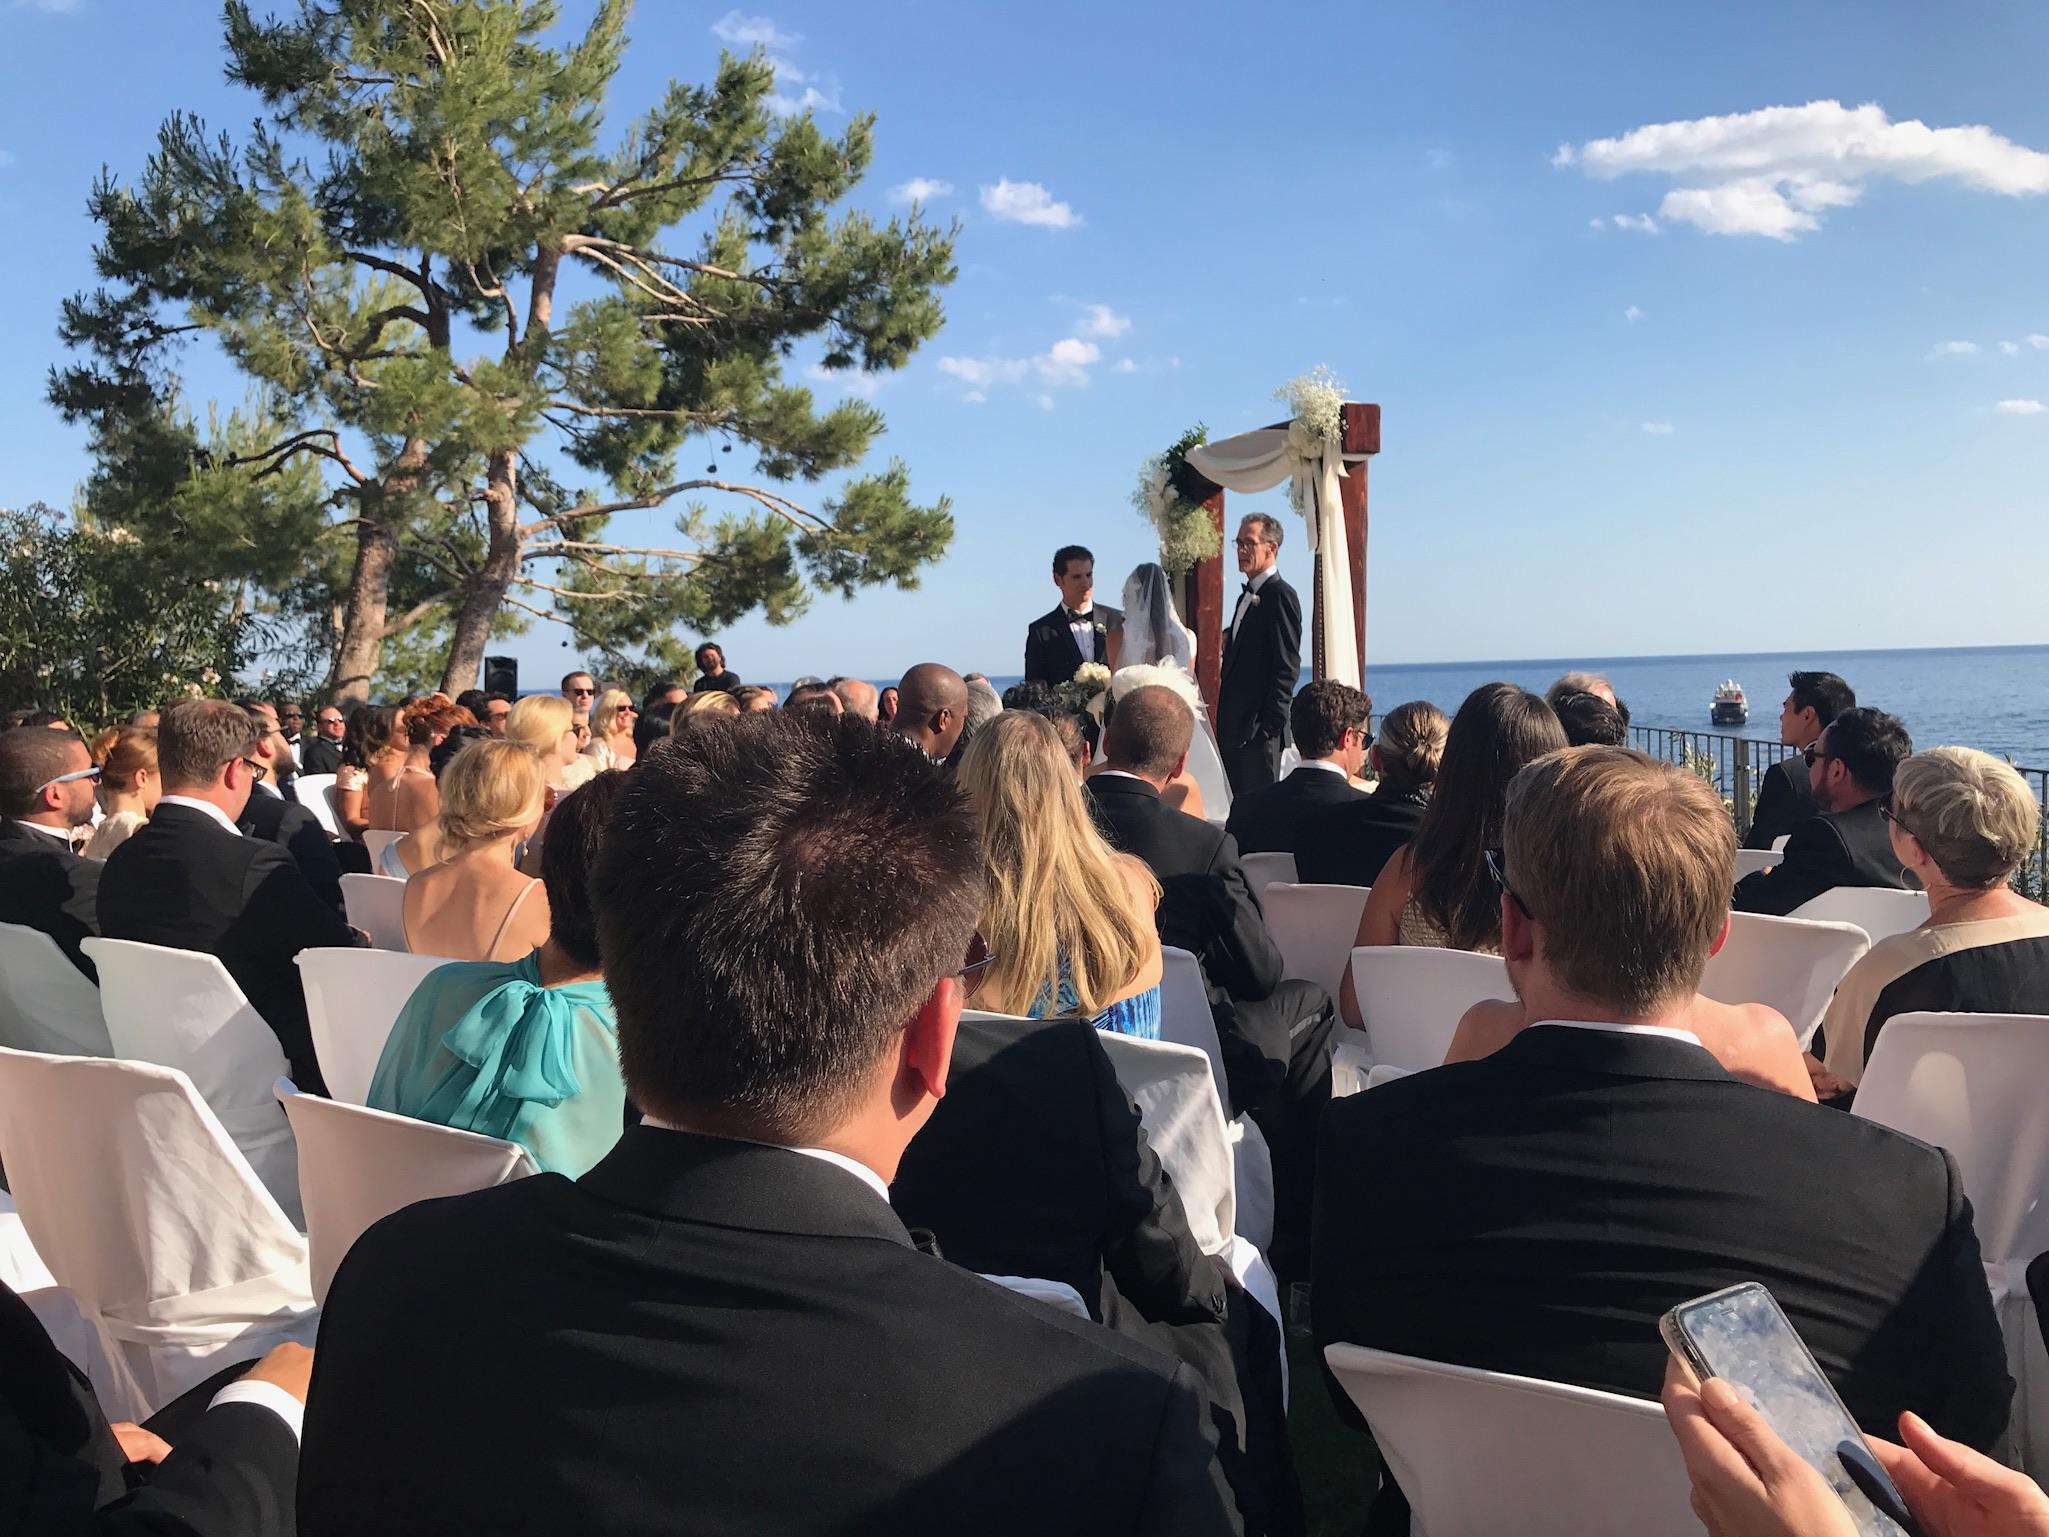 https://www.weddingamalfi.com/wp-content/uploads/Nathalie-and-Benjamin-Wedding-in-Positano-Italy-13.jpg